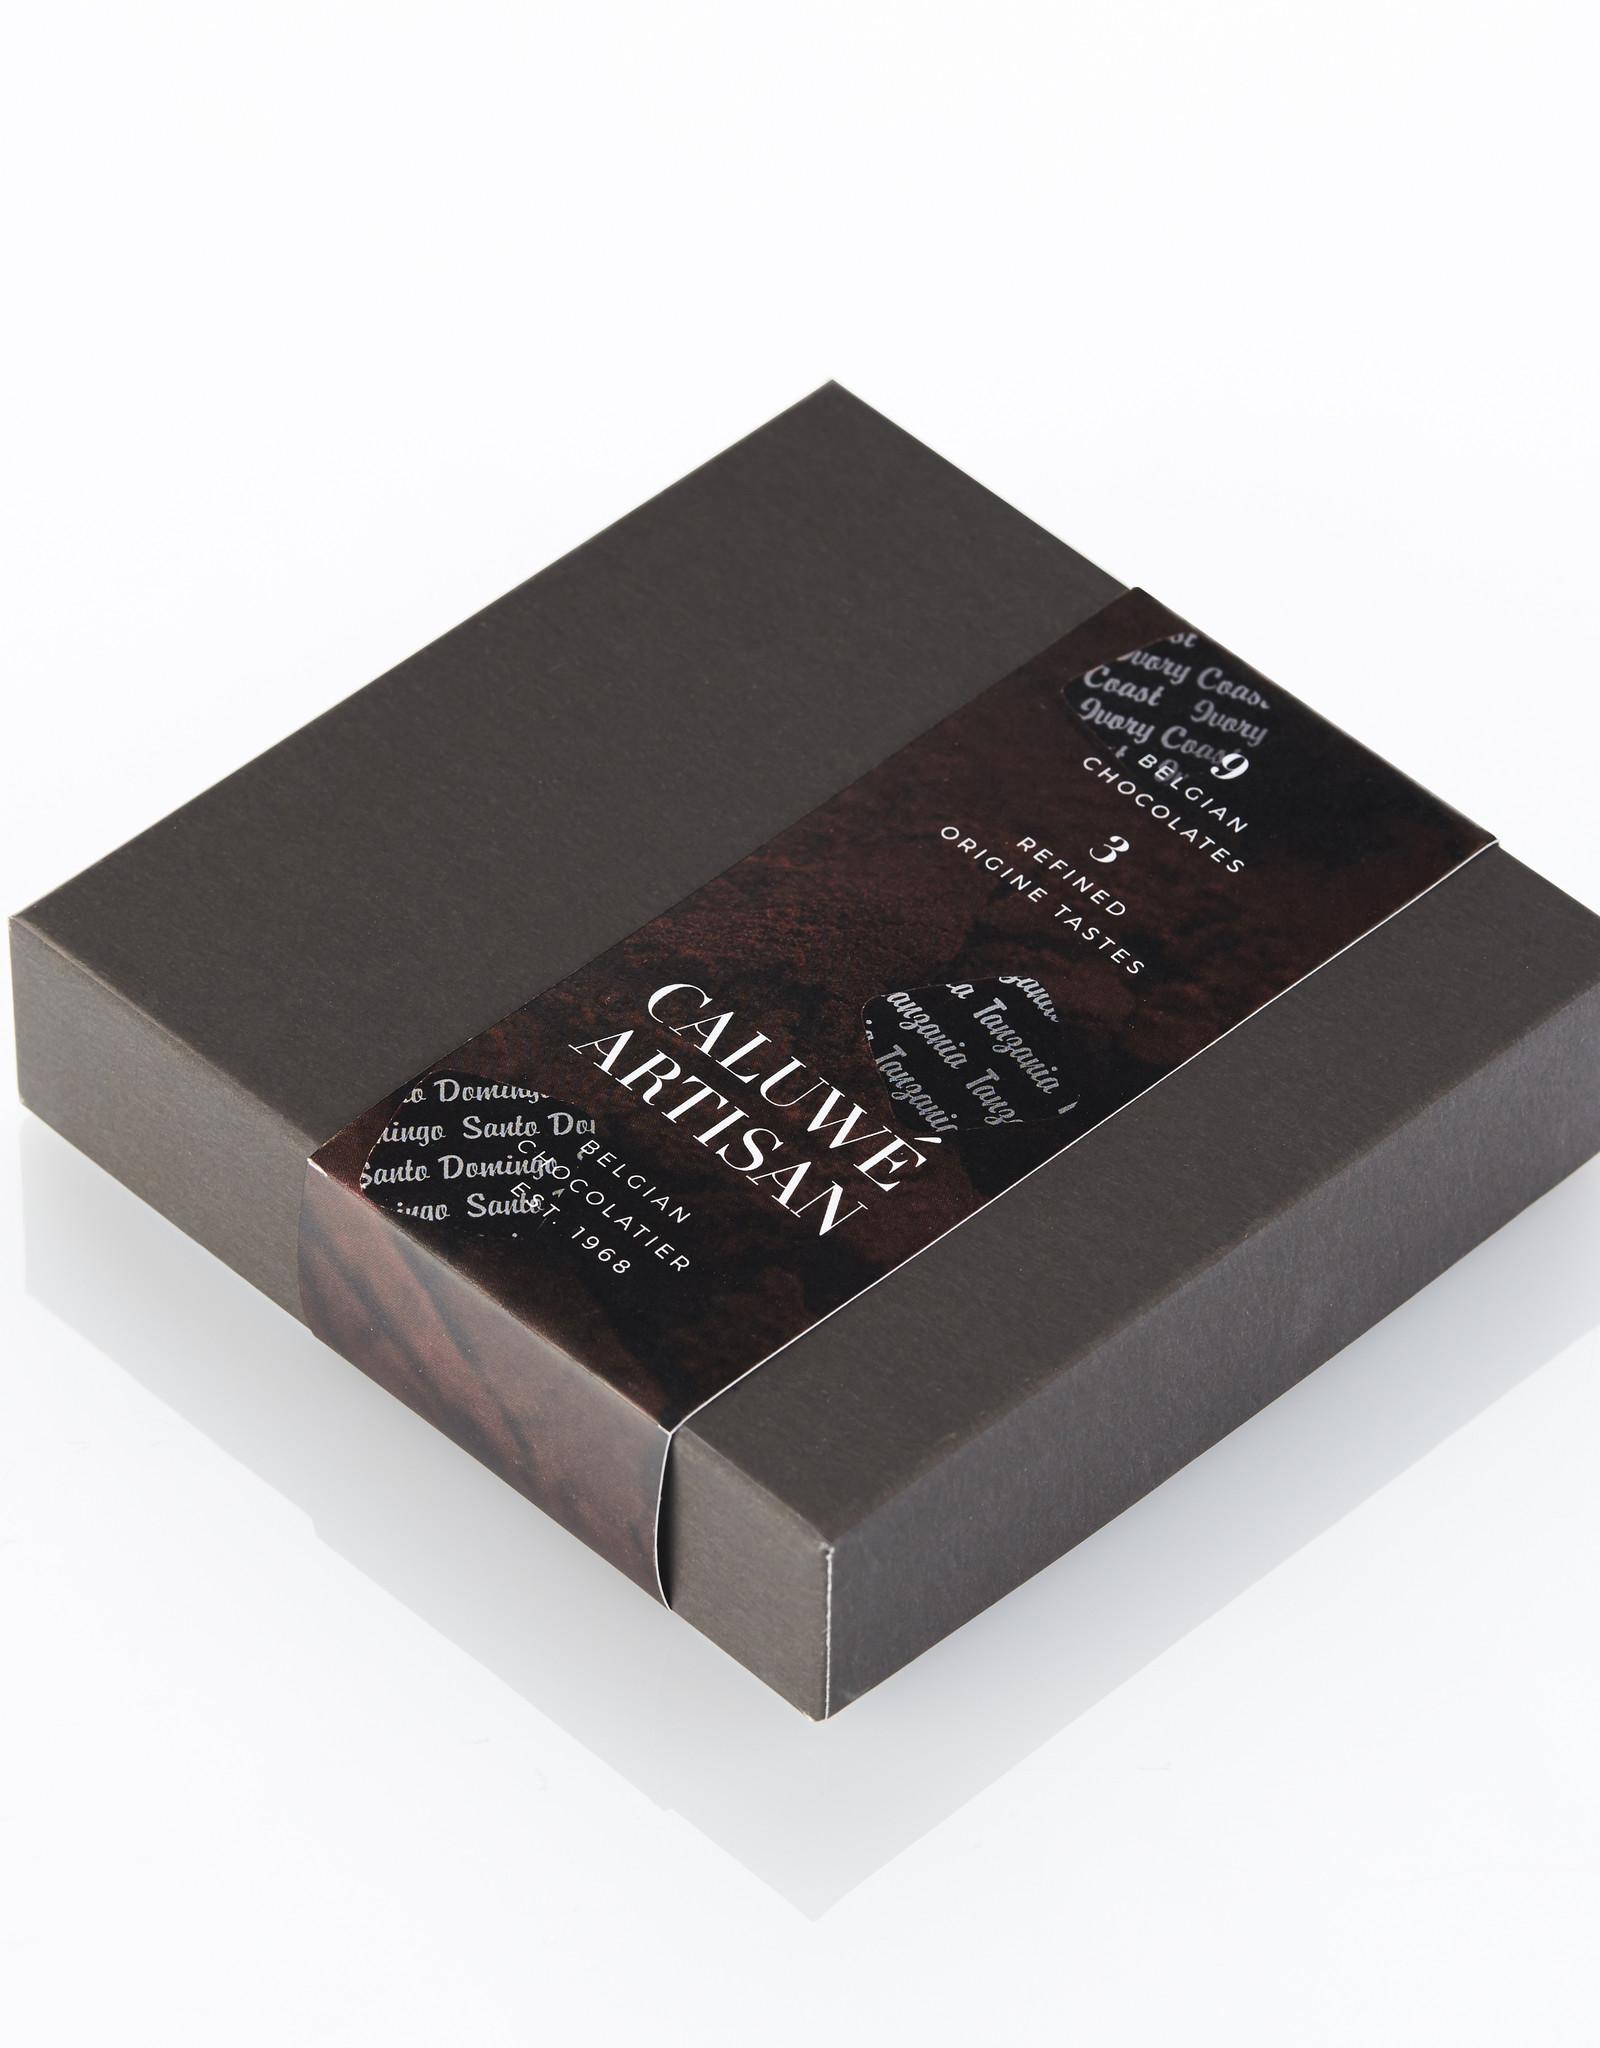 Caluwe Artisan Rigid box 95g - origin assortment - UTZ